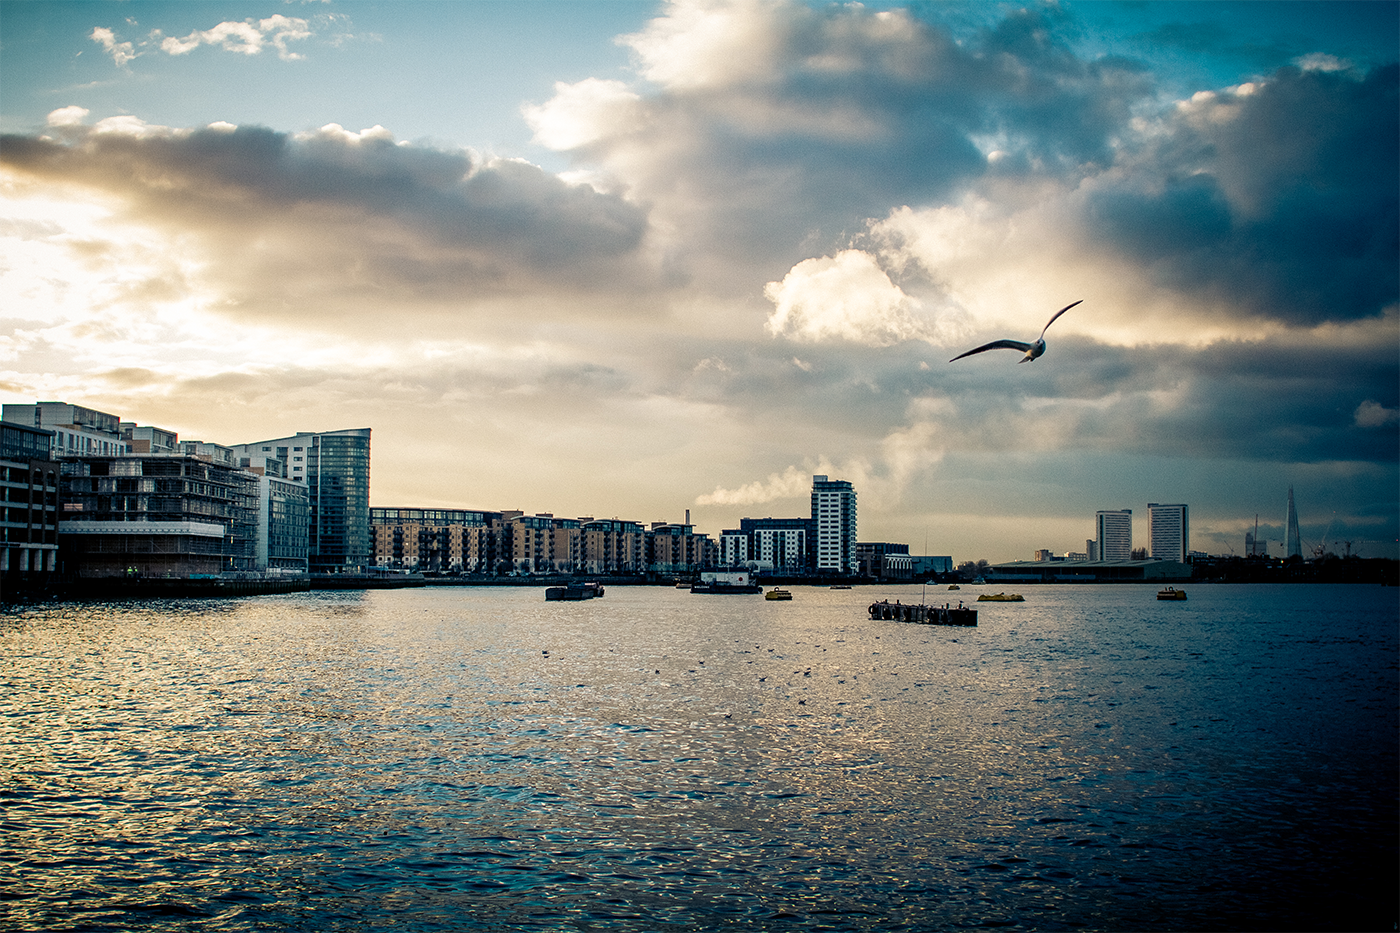 London city streets great britain Urban monuments SKY bridge birds londyn top view water